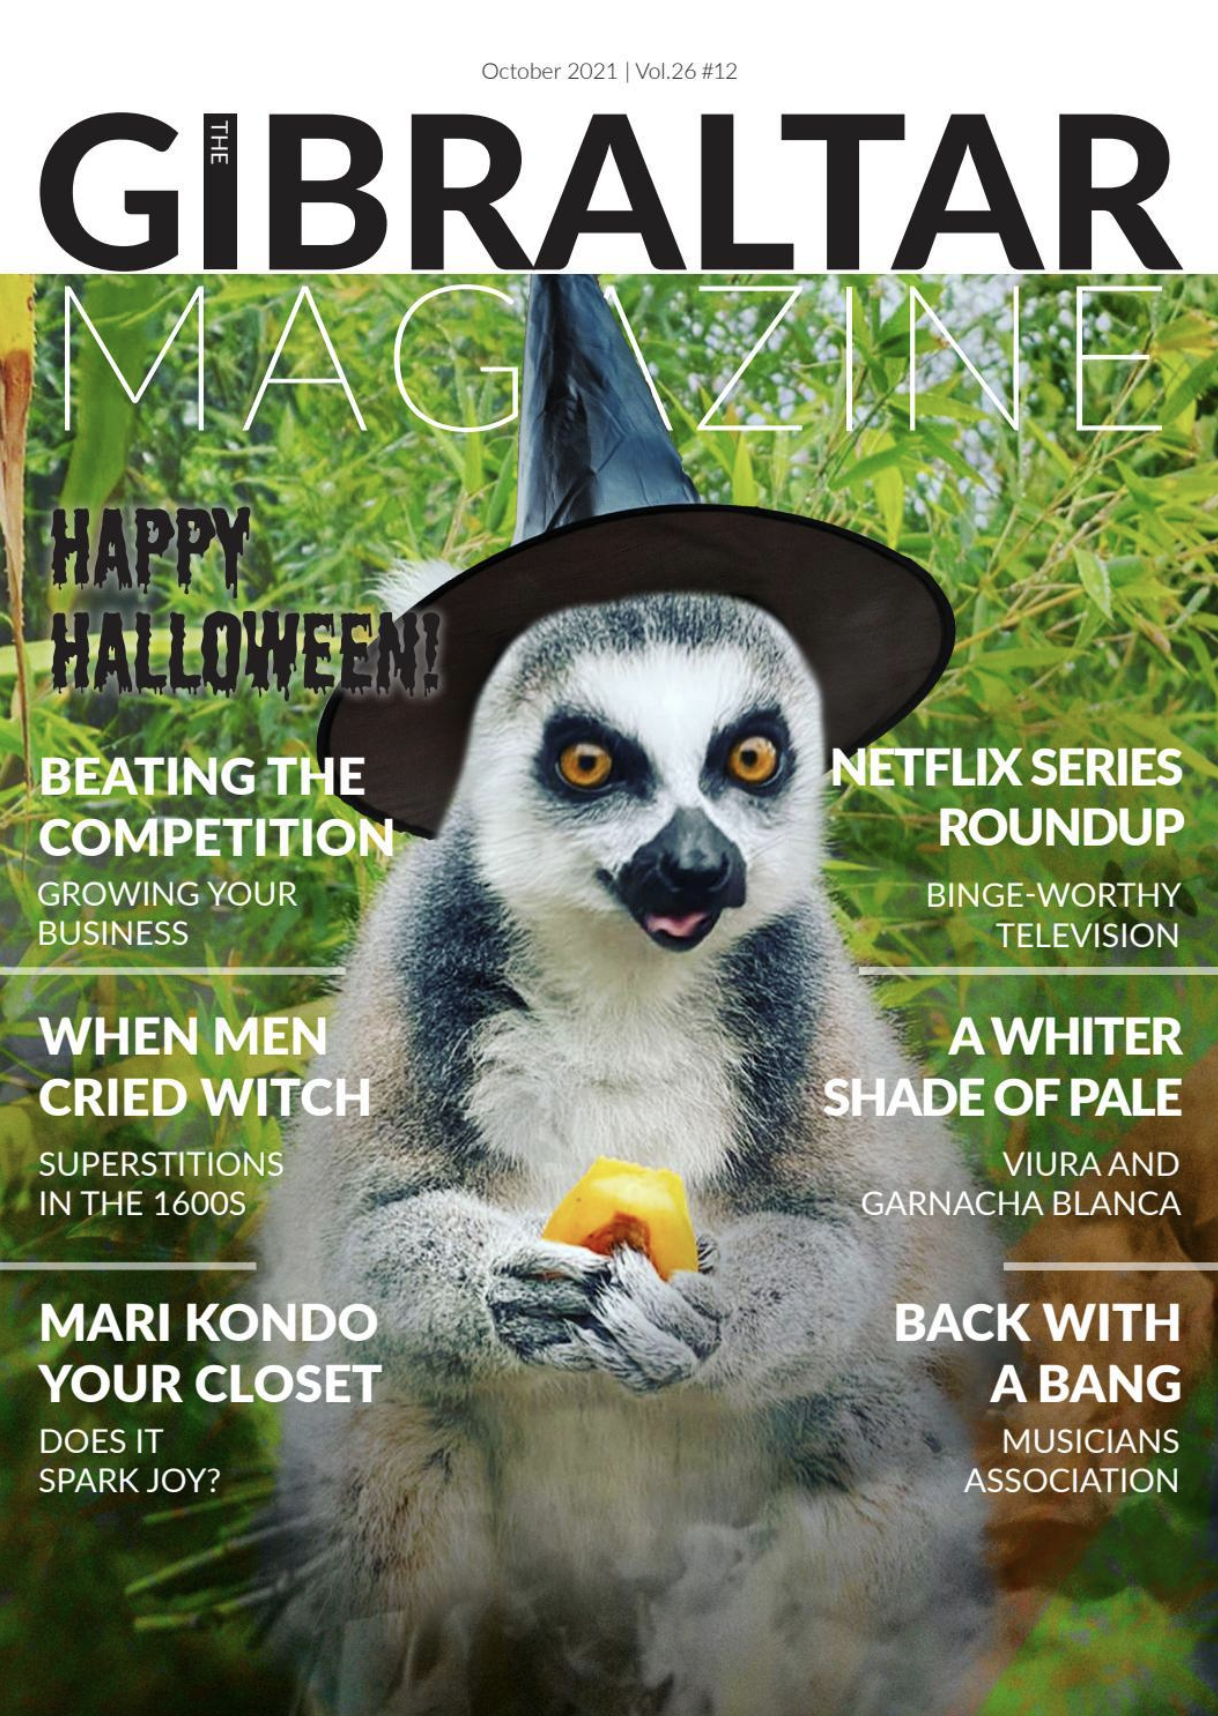 The Gibraltar Magazine